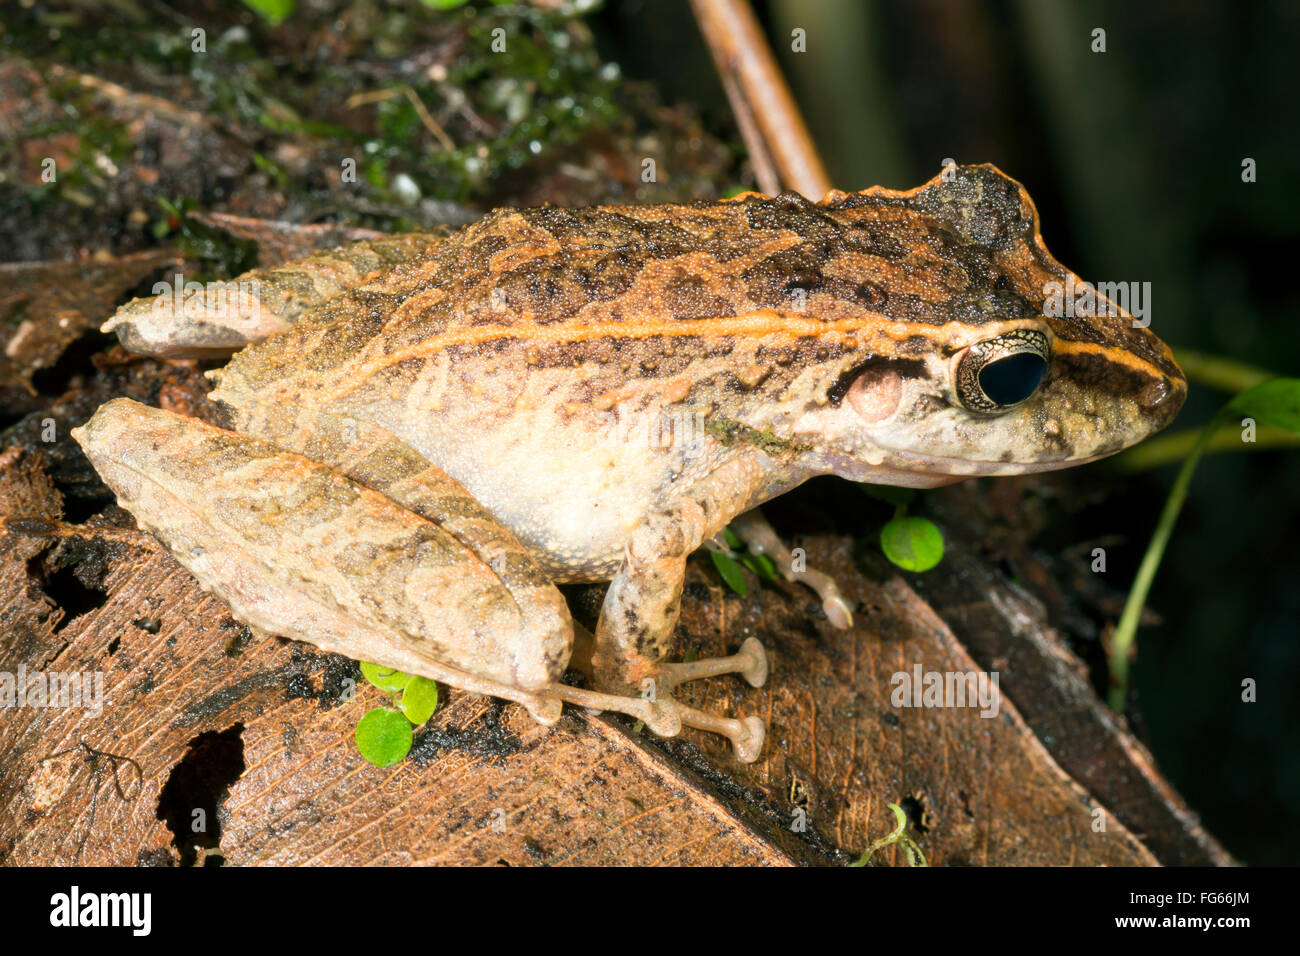 Metallic Robber Frog (Pristimantis lanthanites) in the rainforest understory in Pastaza province, Ecuador - Stock Image